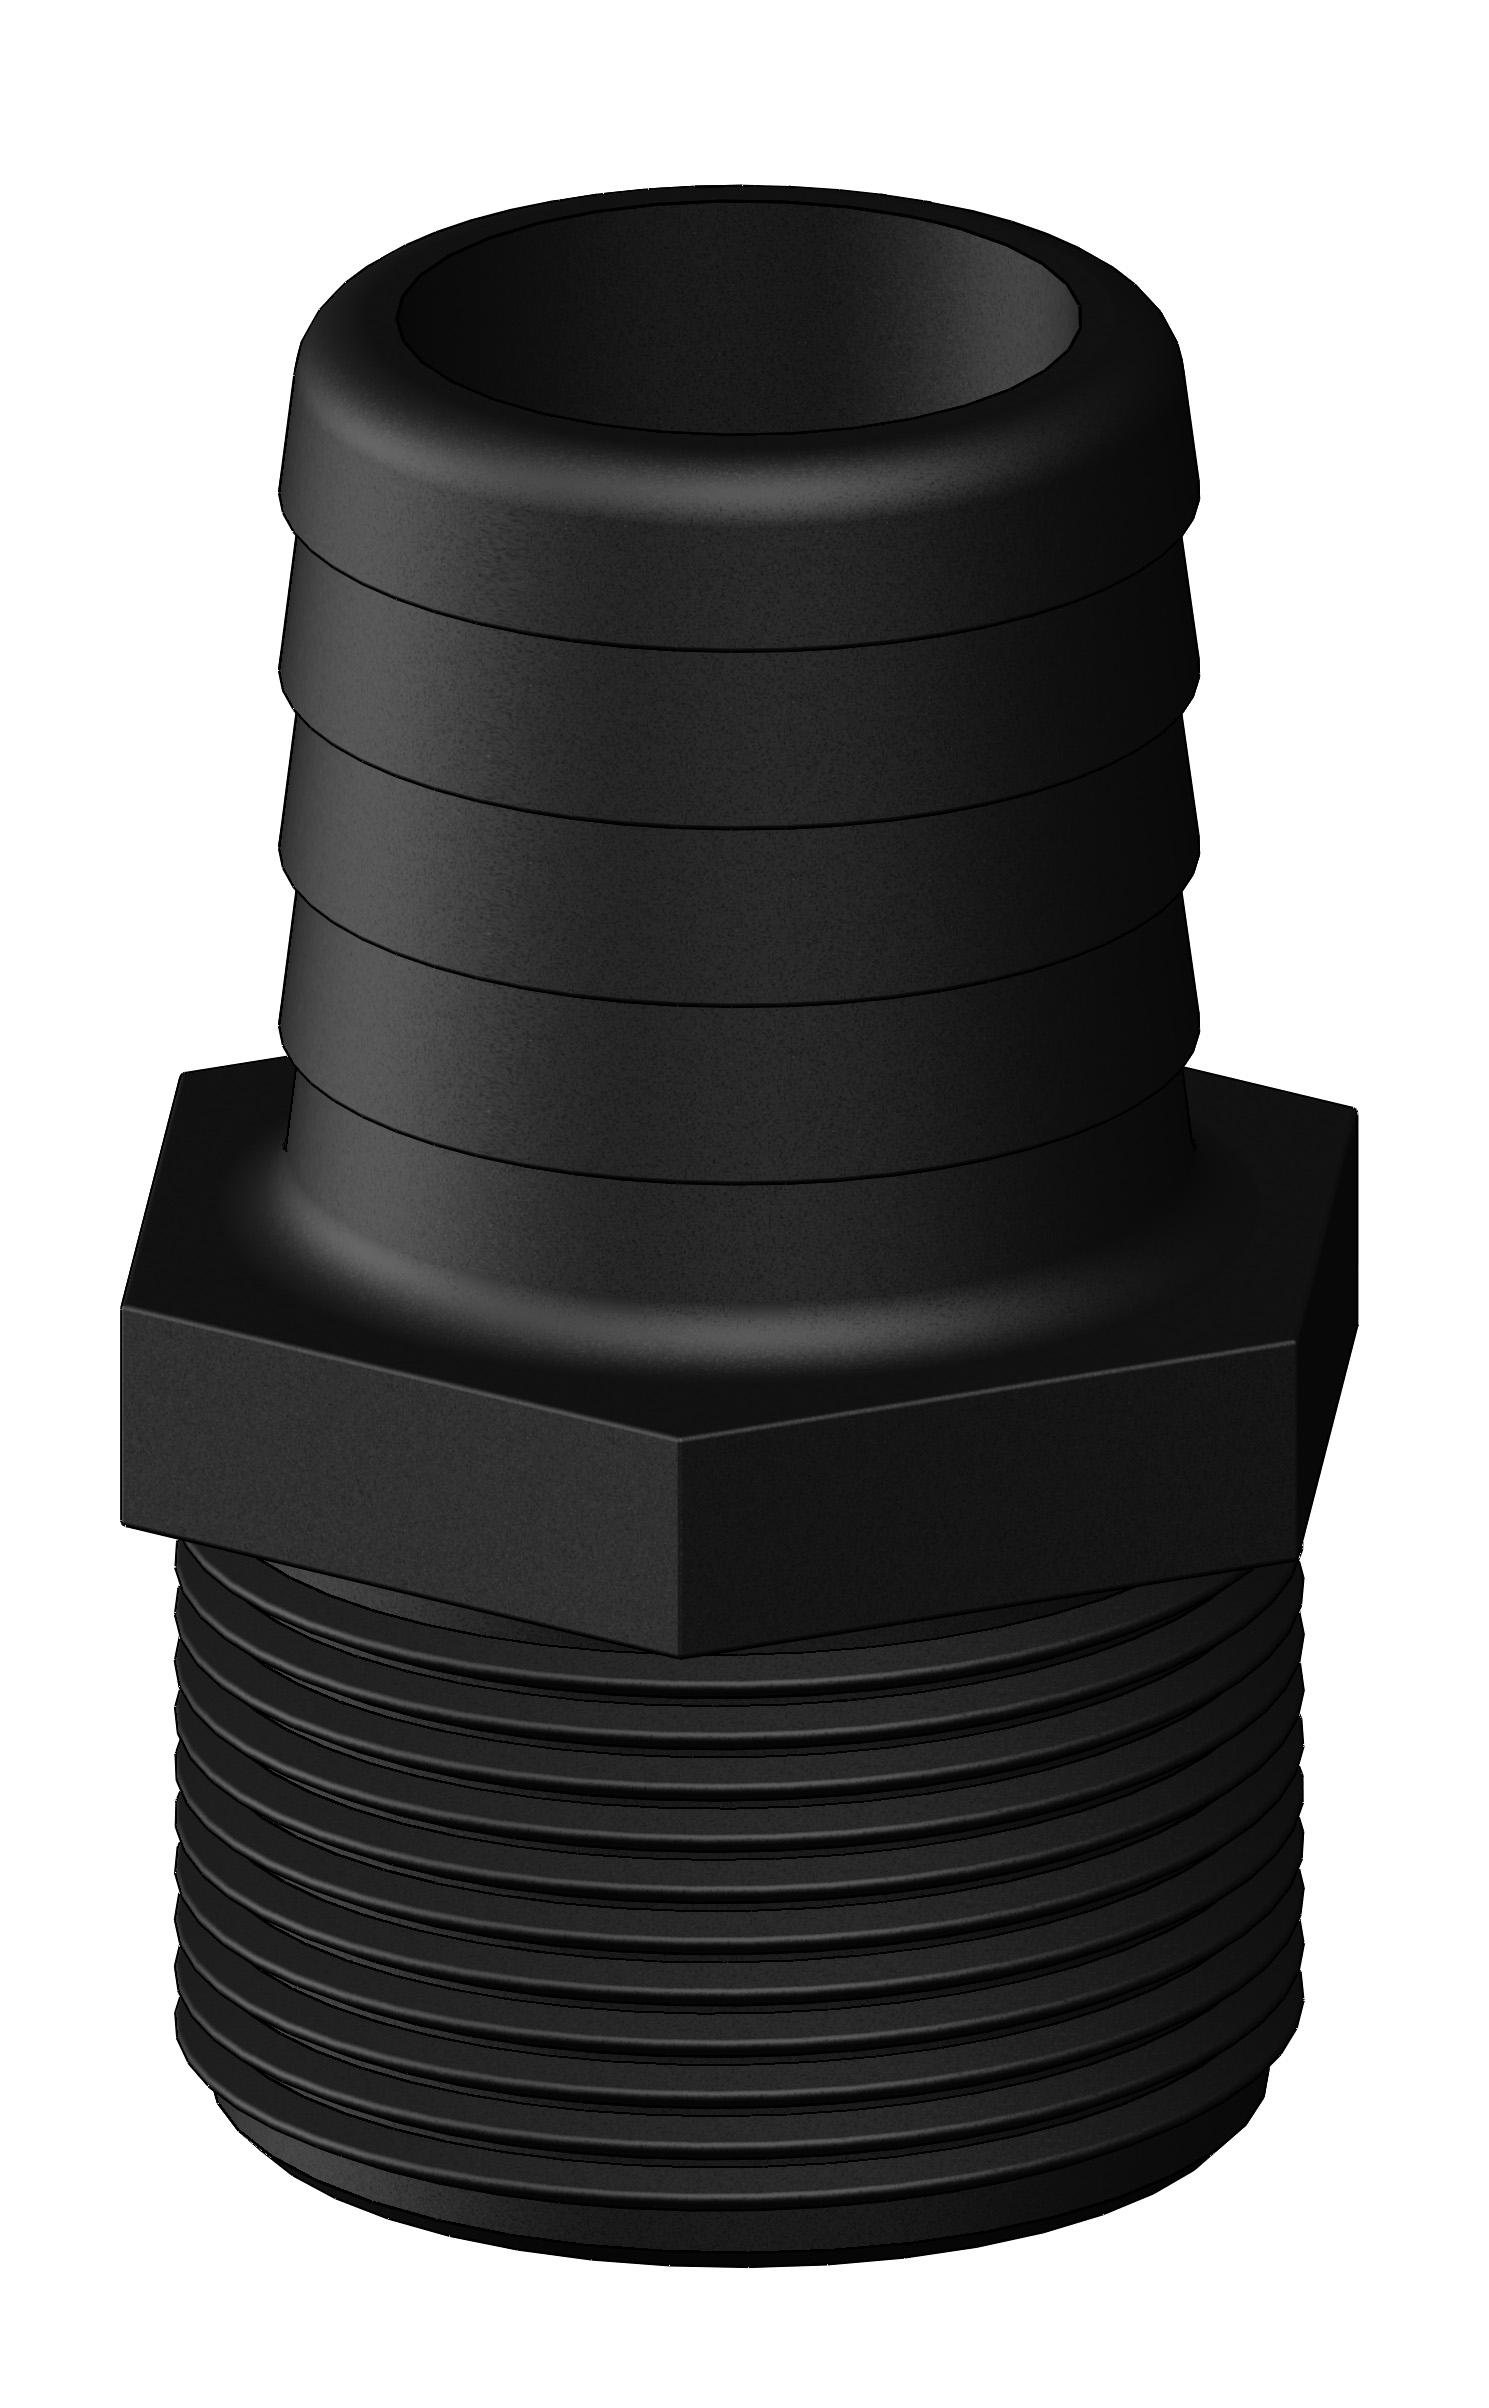 Slangsockel 1 1/2 38mm